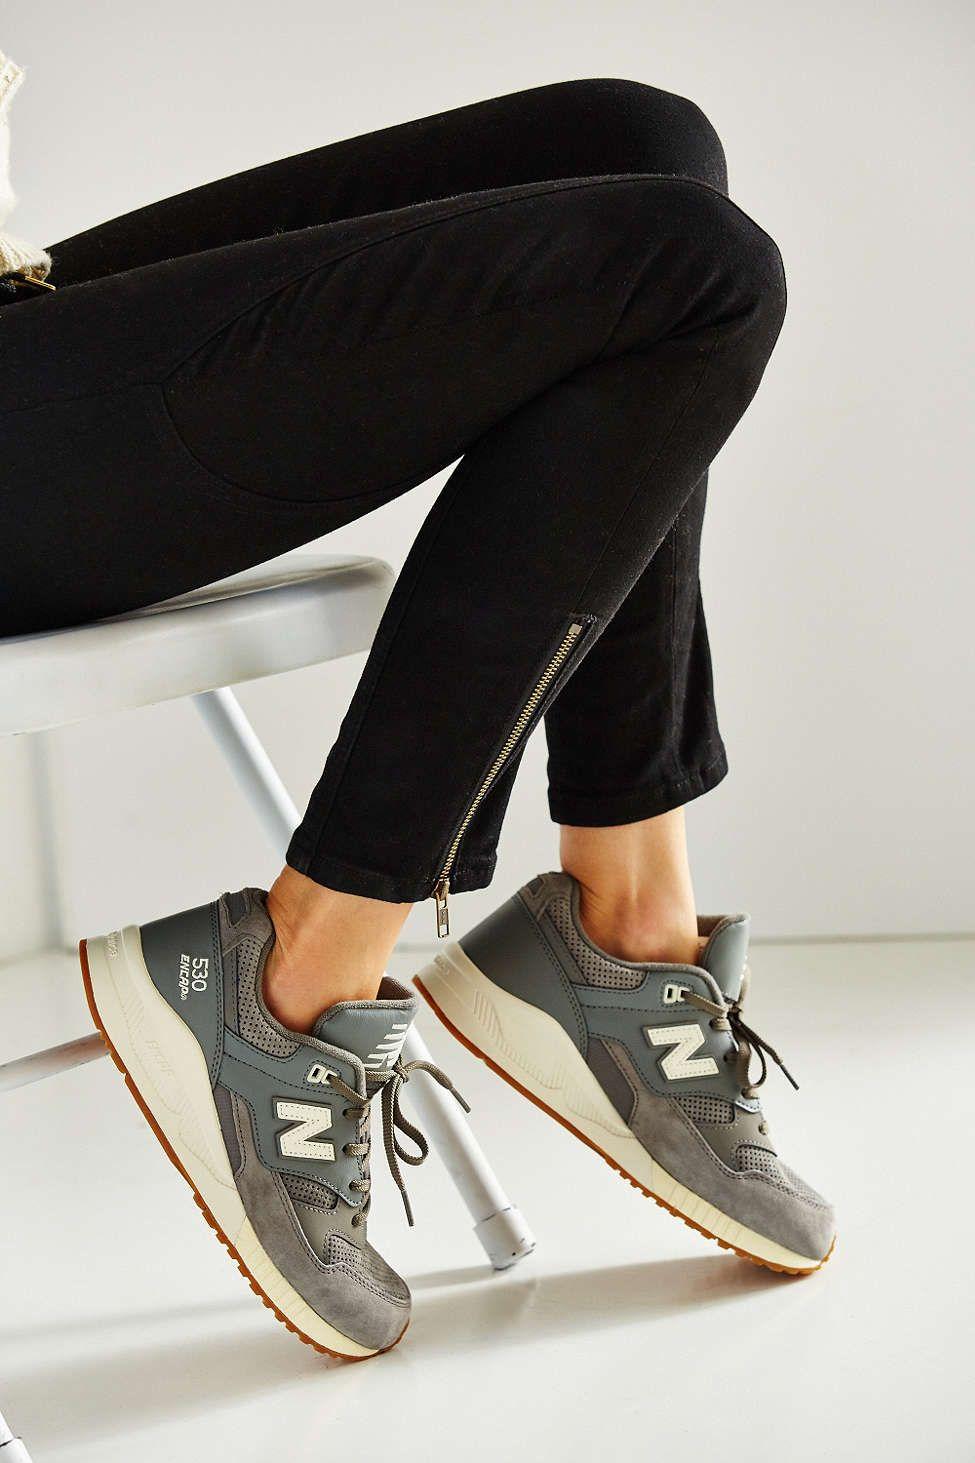 Solid 530 Balance urbanoutfitters S Running 90s Sneaker New twEBw